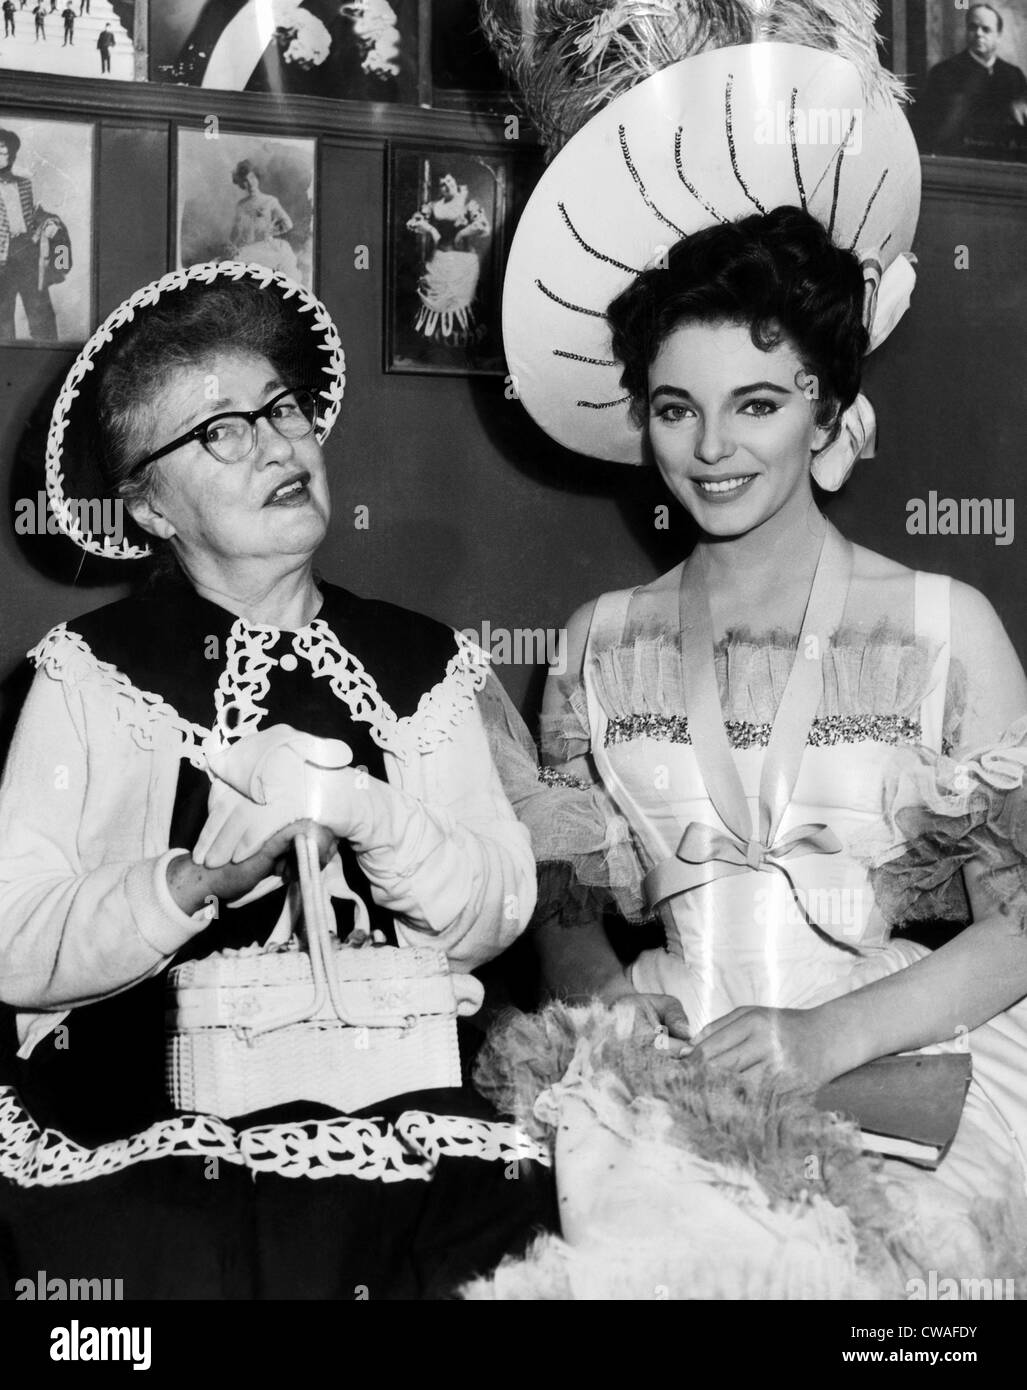 "Evelyn Nesbit (links), dem Filmset zu besuchen, wo Joan Collins (rechts) sie in dem Film porträtiert ist ""The Stockbild"